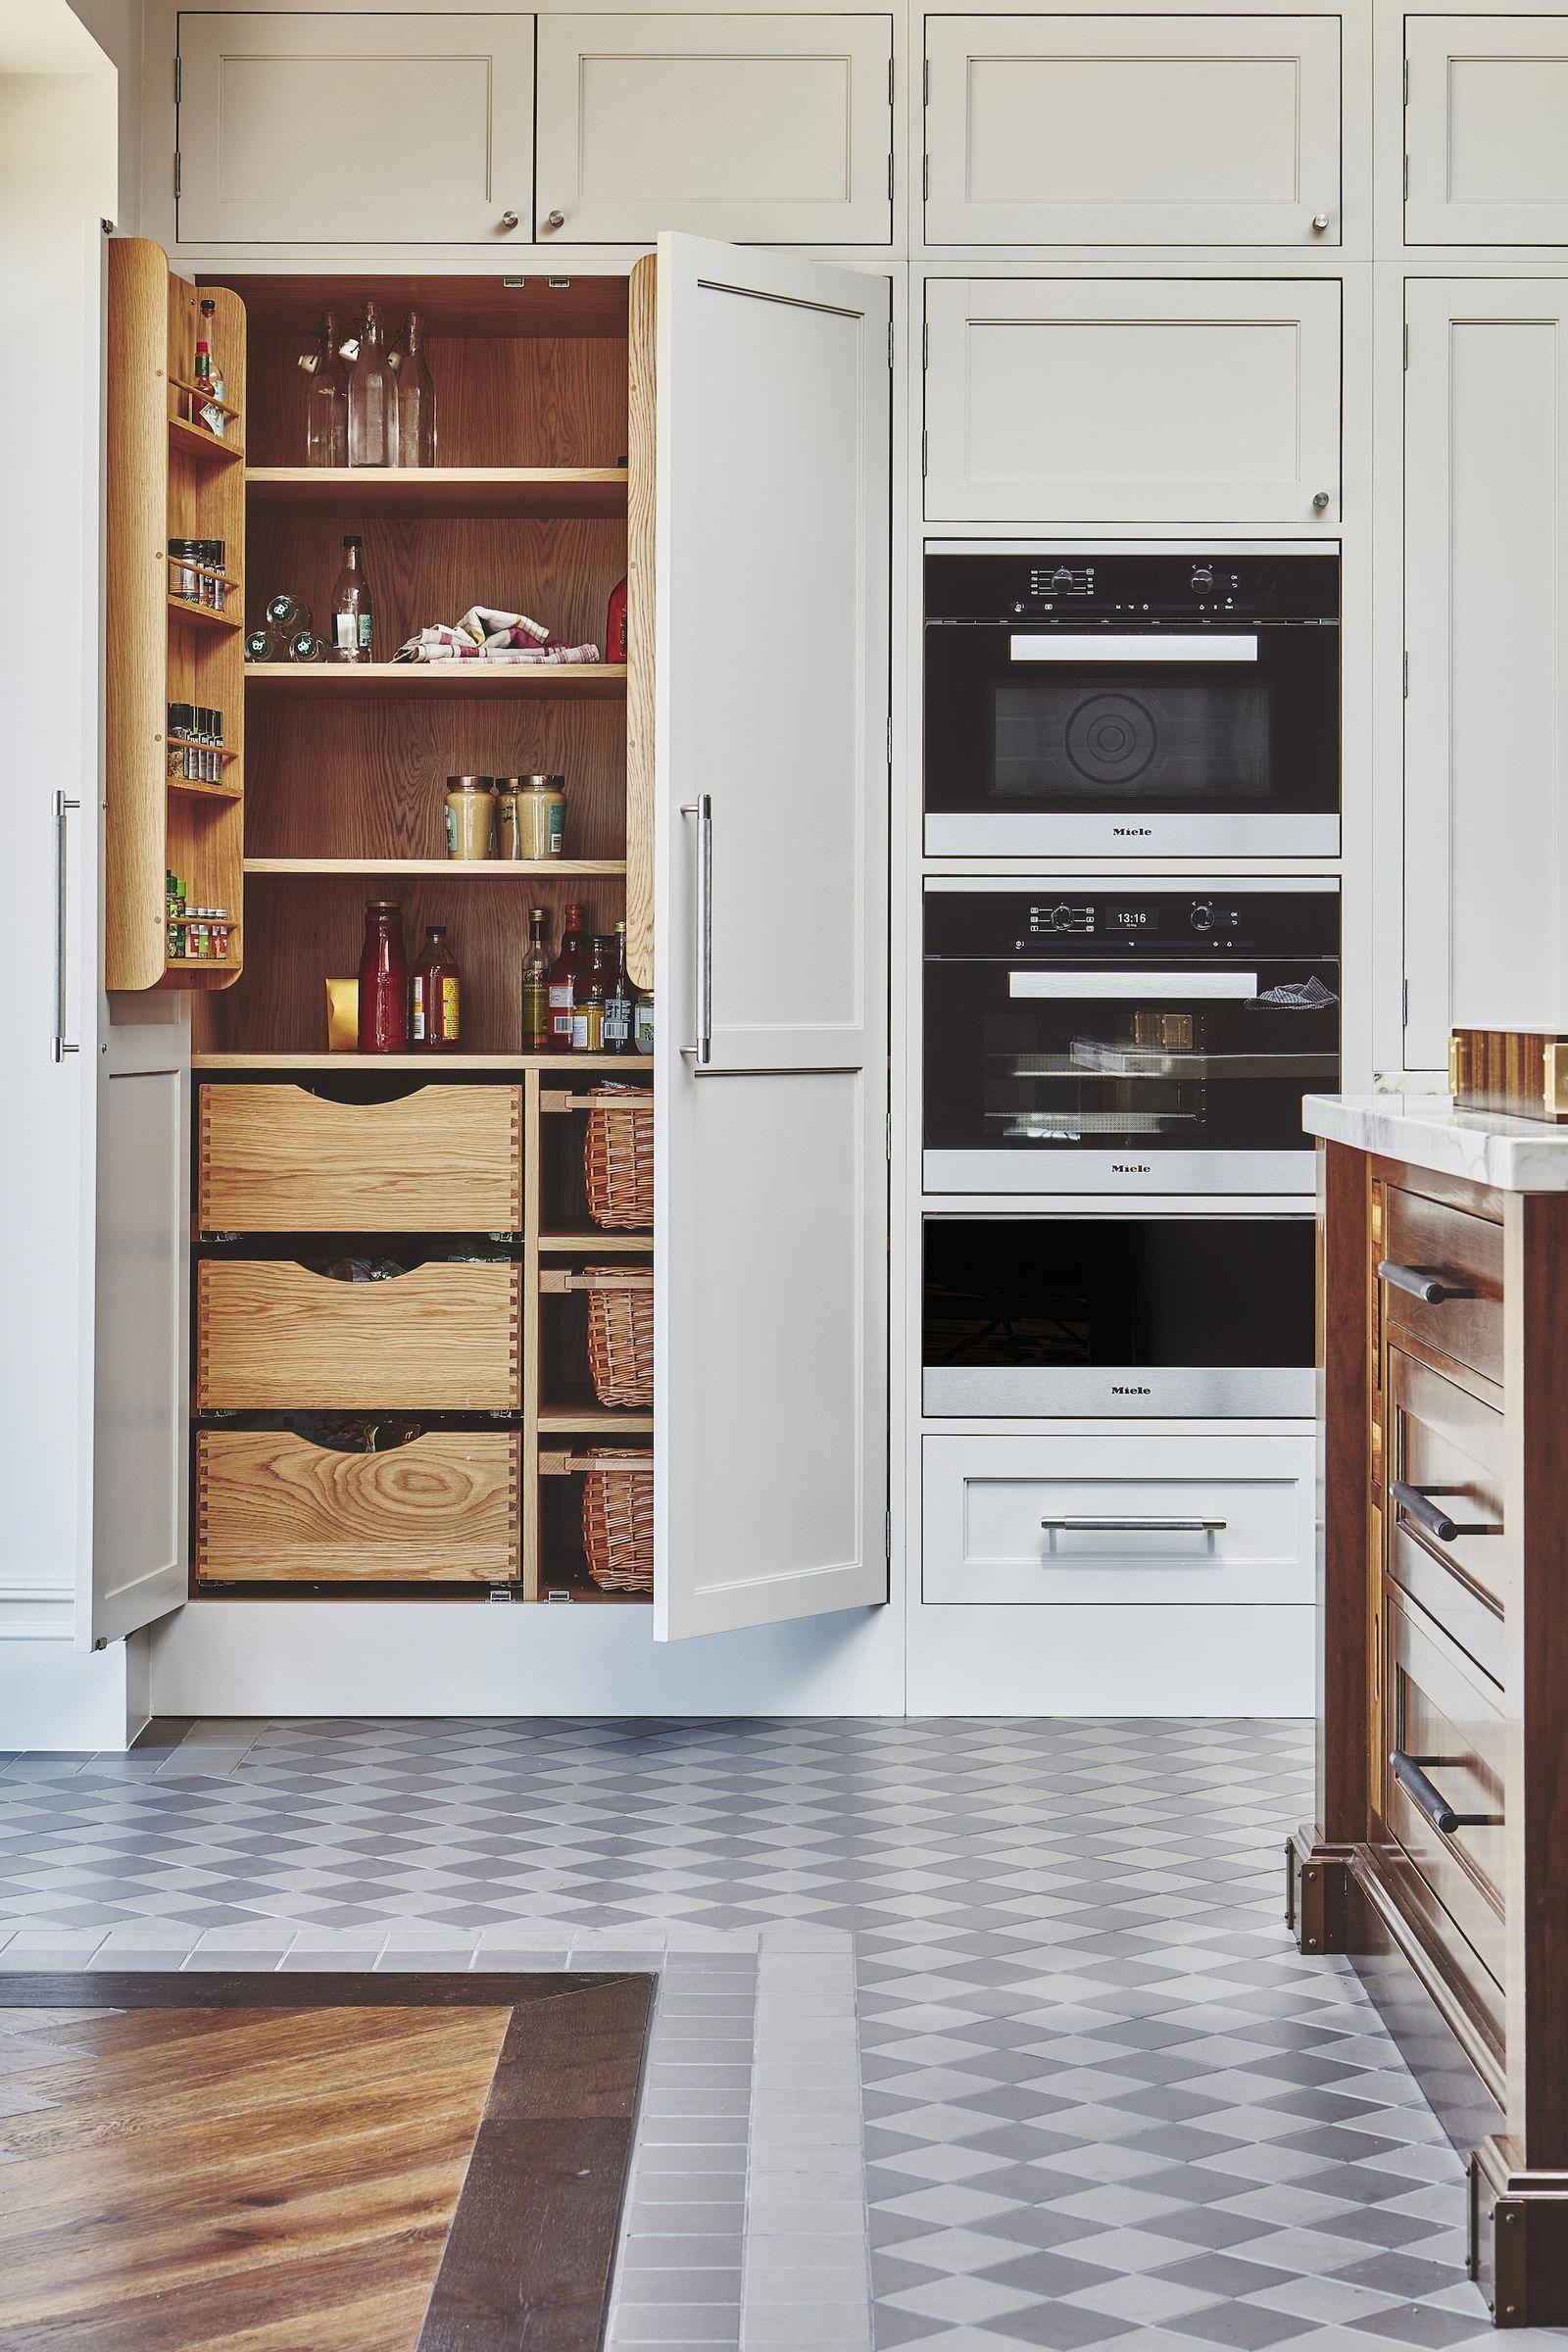 73 Small Modern White Kitchen Ideas Kitchen Design Trends Modern Kitchen Design Kitchen Trends